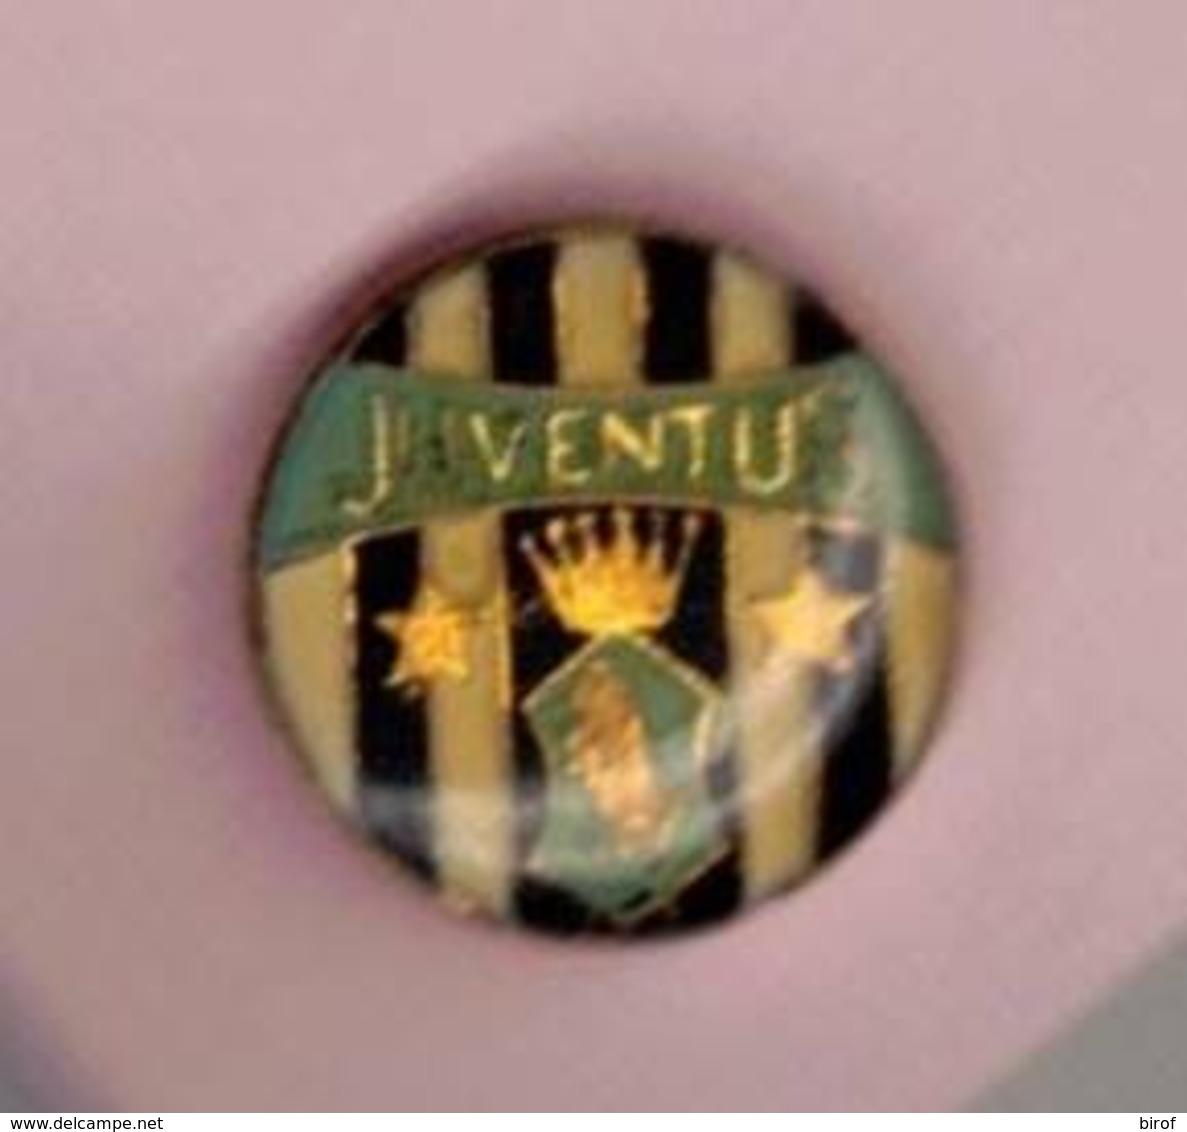 PIN'S - SPILLA - DISTINTIVO -  CALCIO FOOTBALL SQUADRA JUVENTUS ( ANNI 80' ? ) - Calcio